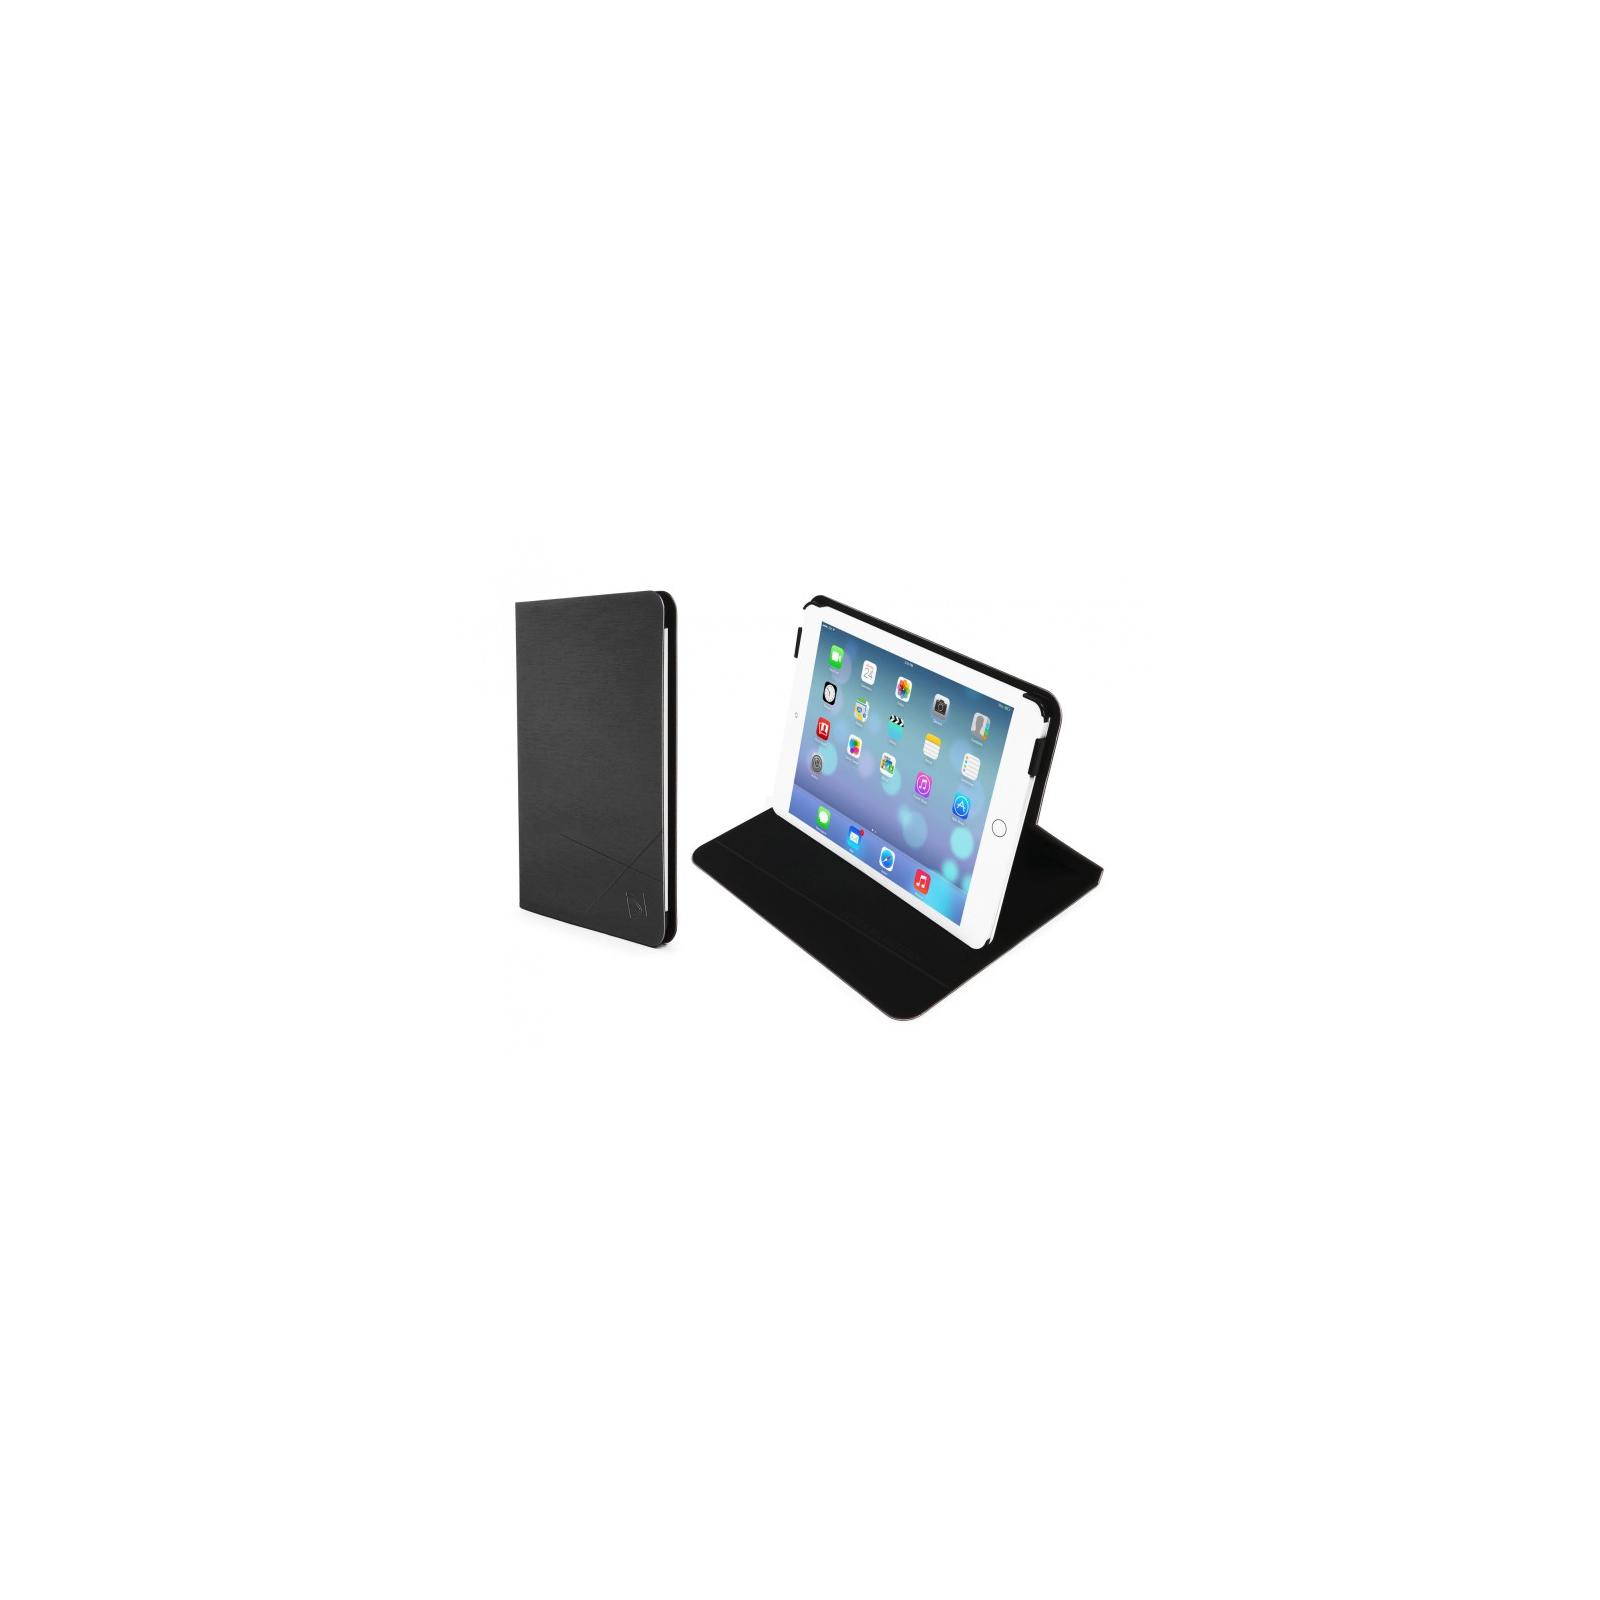 Чехол для планшета Tucano iPad Air Filo Black (IPD5FI) изображение 2